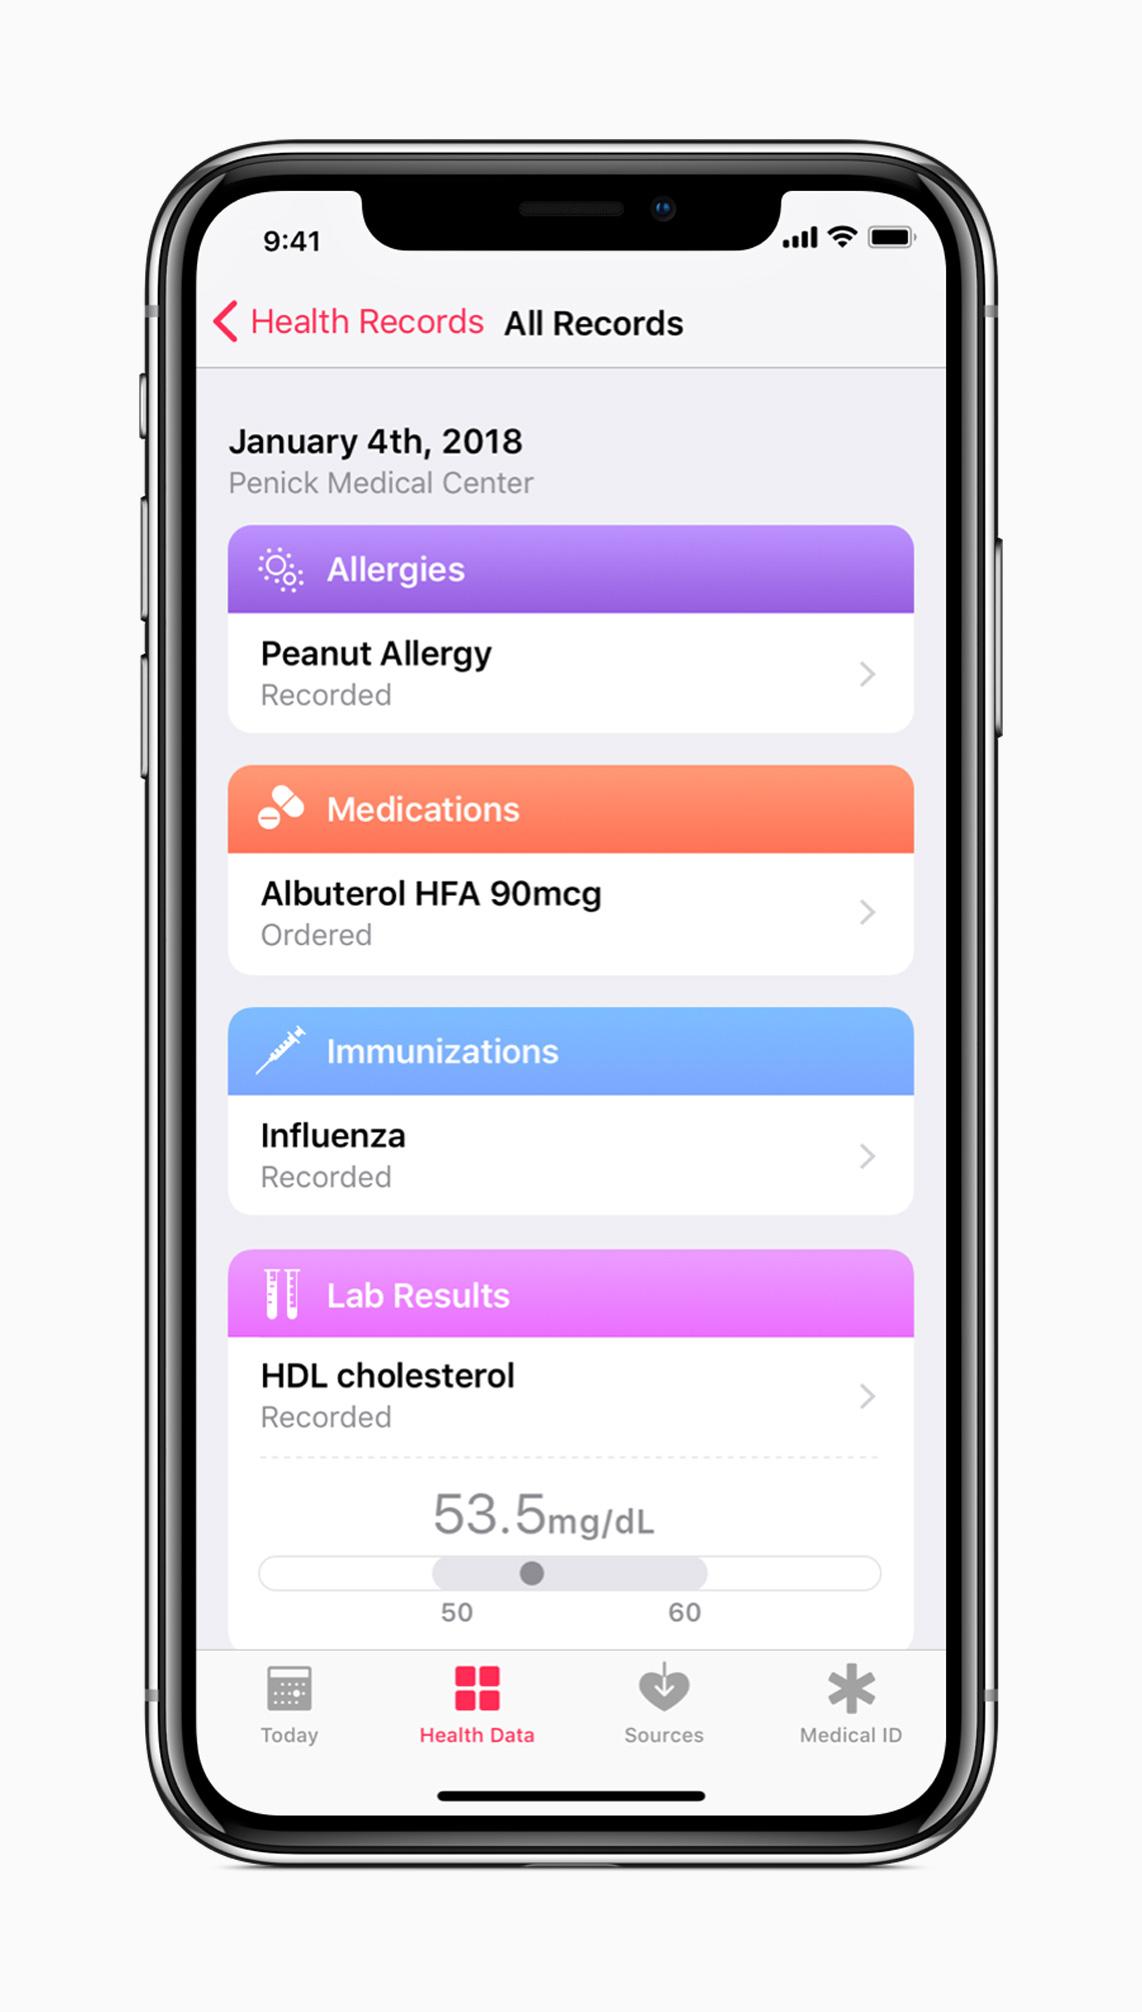 iPhone_X_Health_Records_screen_01232018.jpg